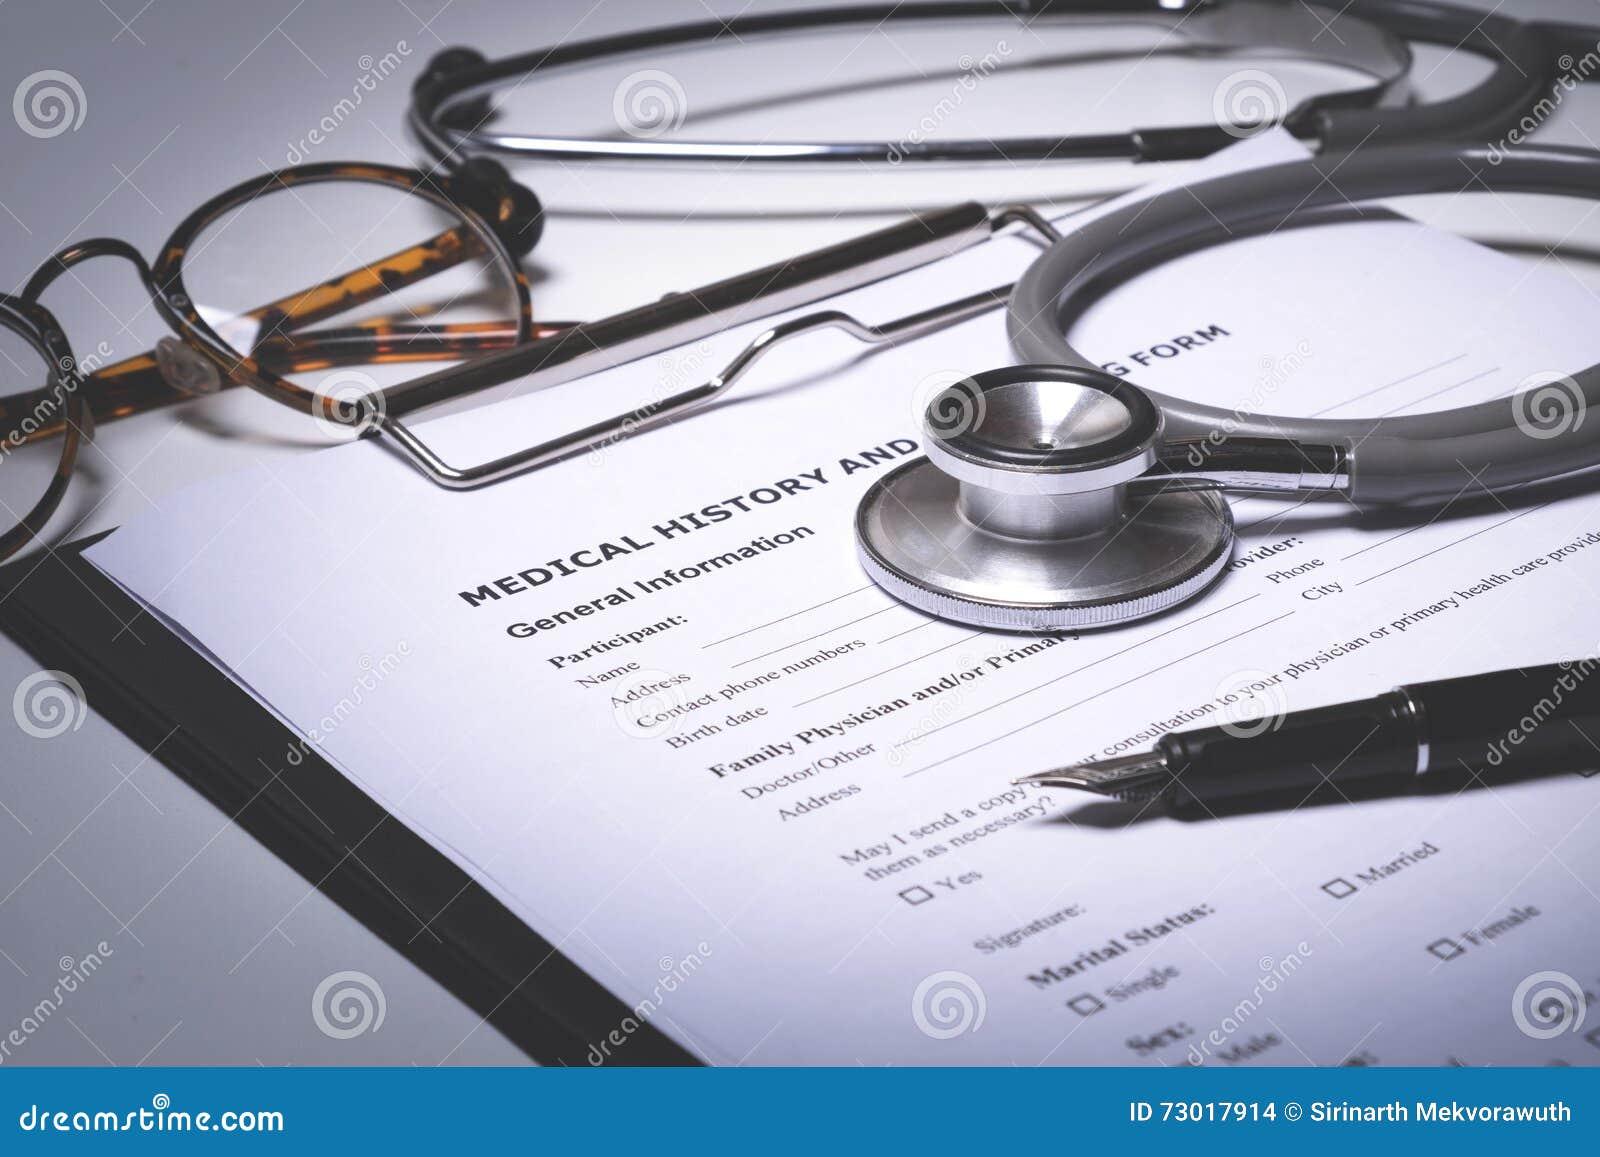 Doctor working desktop  stock photo  Image of illness - 73017914